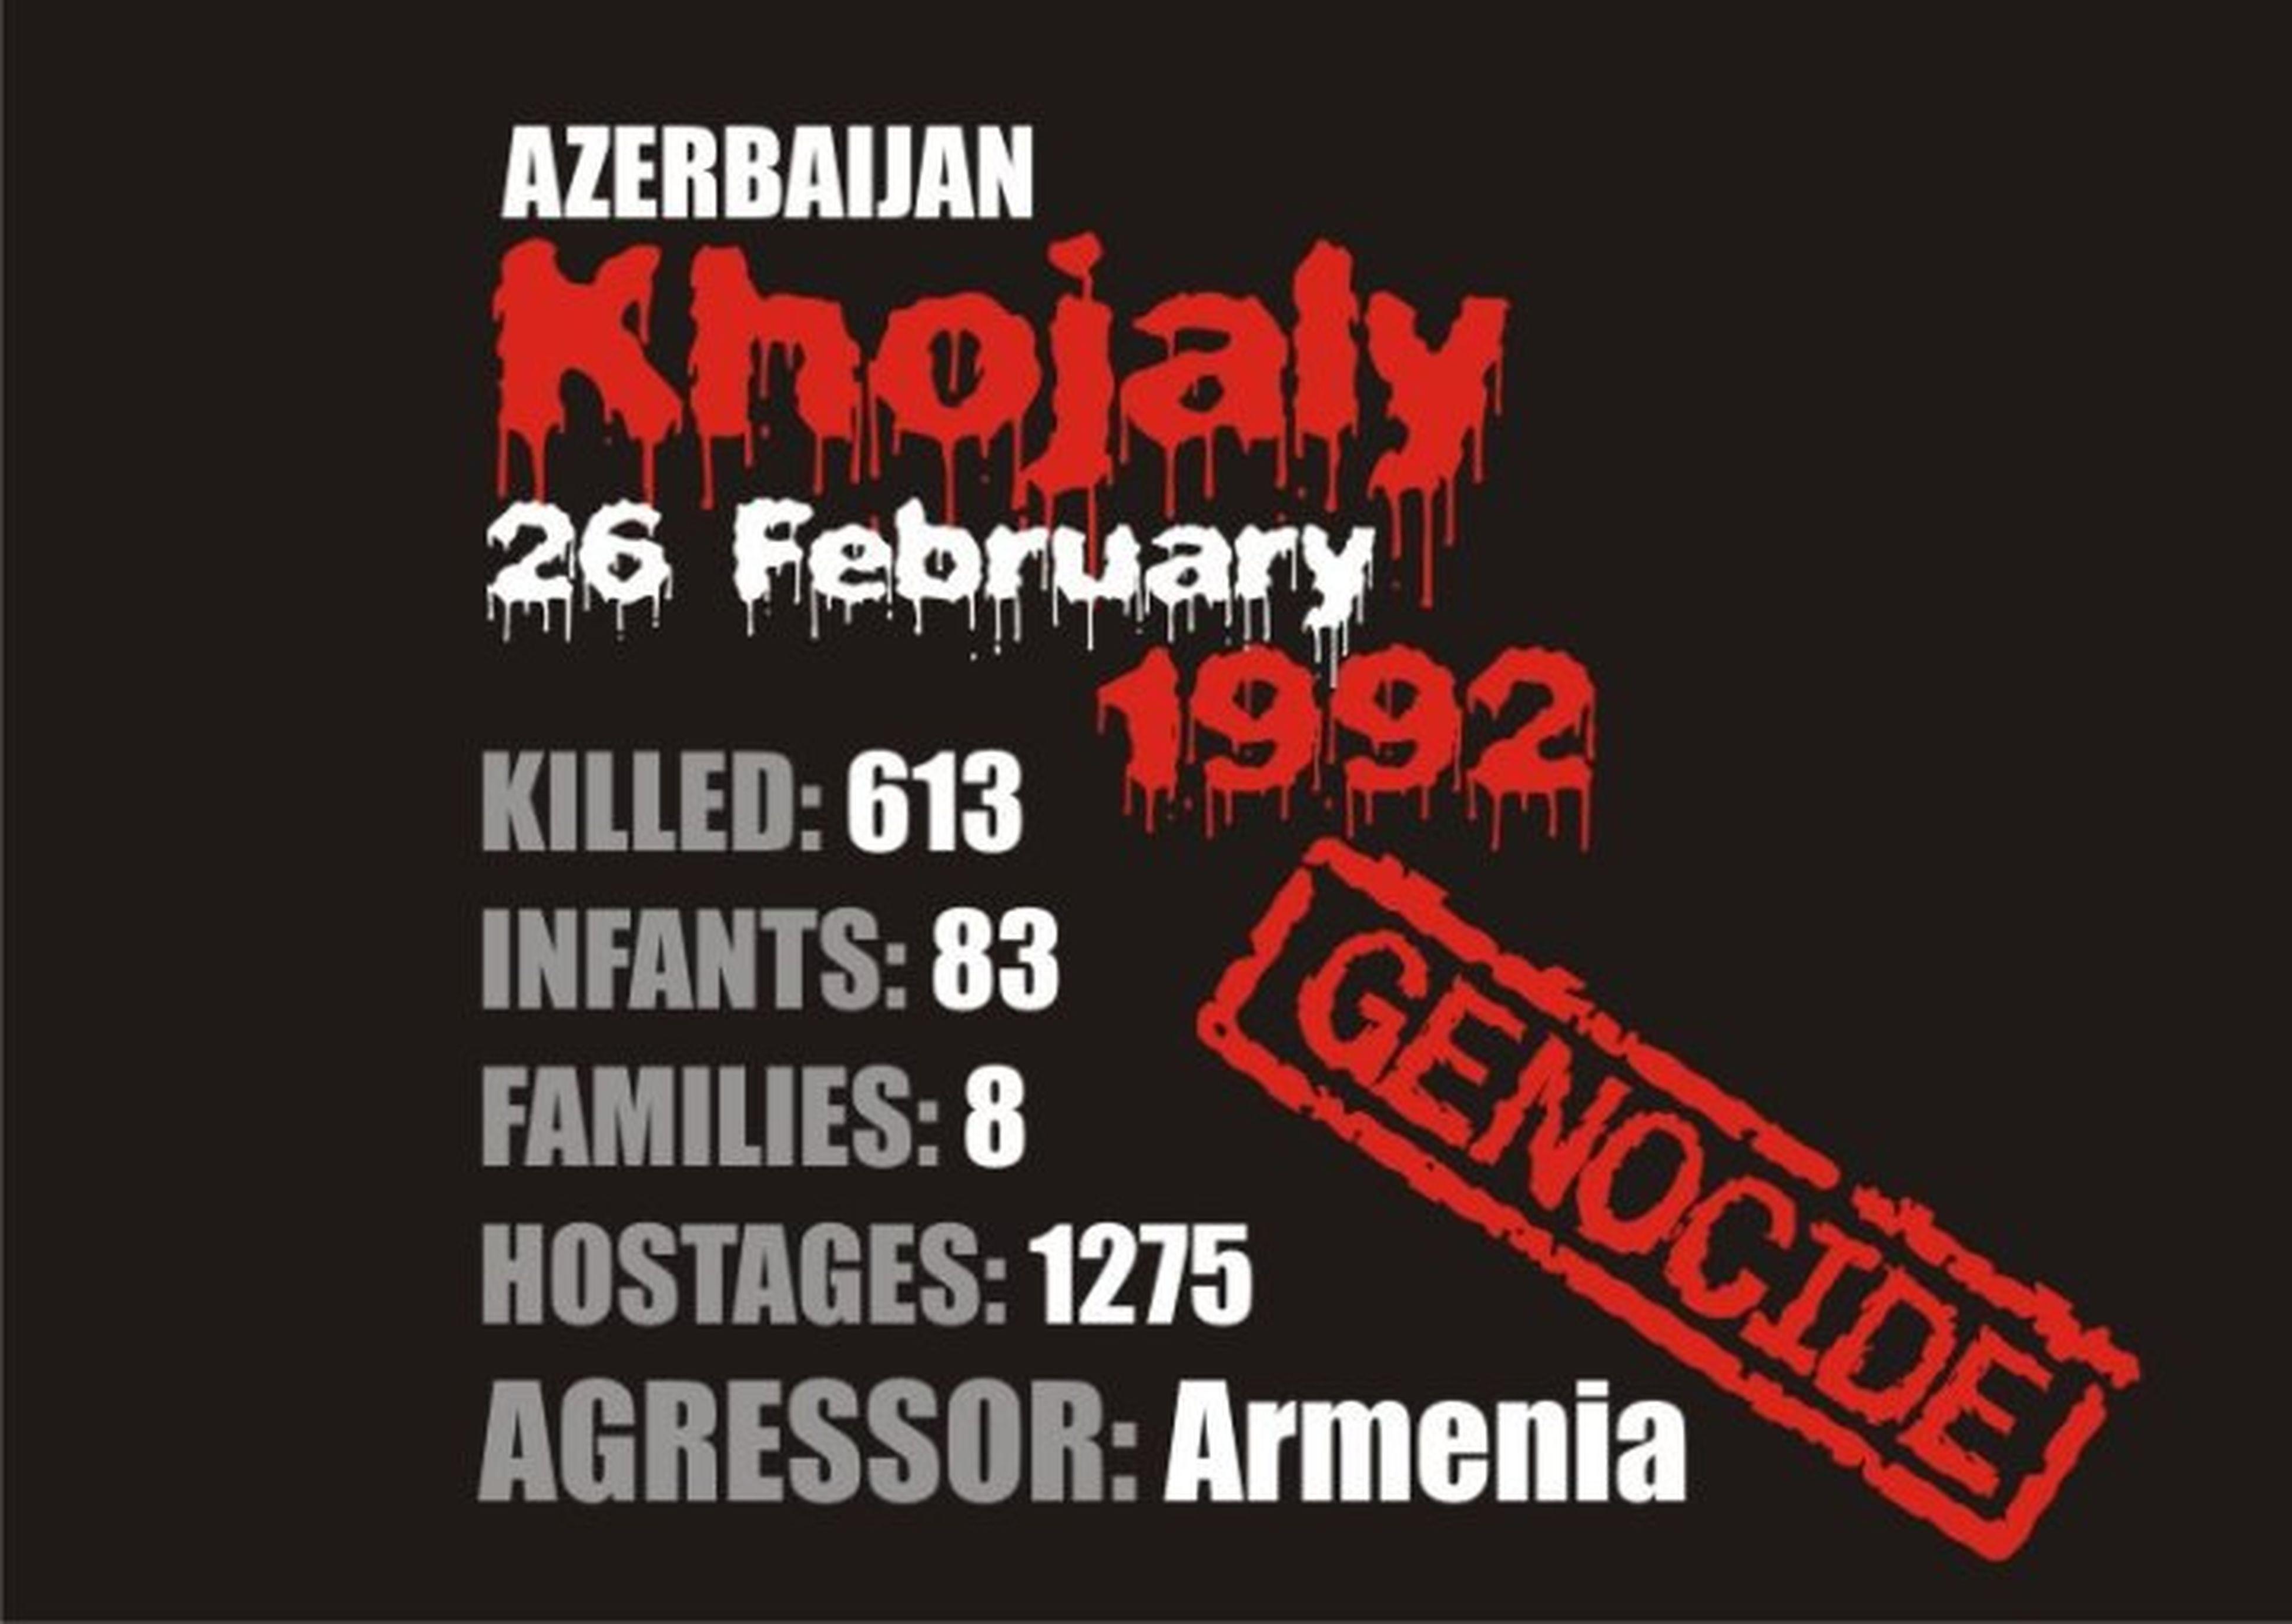 Karabagh Xocali Unutmuruq Sehidlerimiz Ermenialcaglari Allahbizimsehidlerimizerehmetelesin